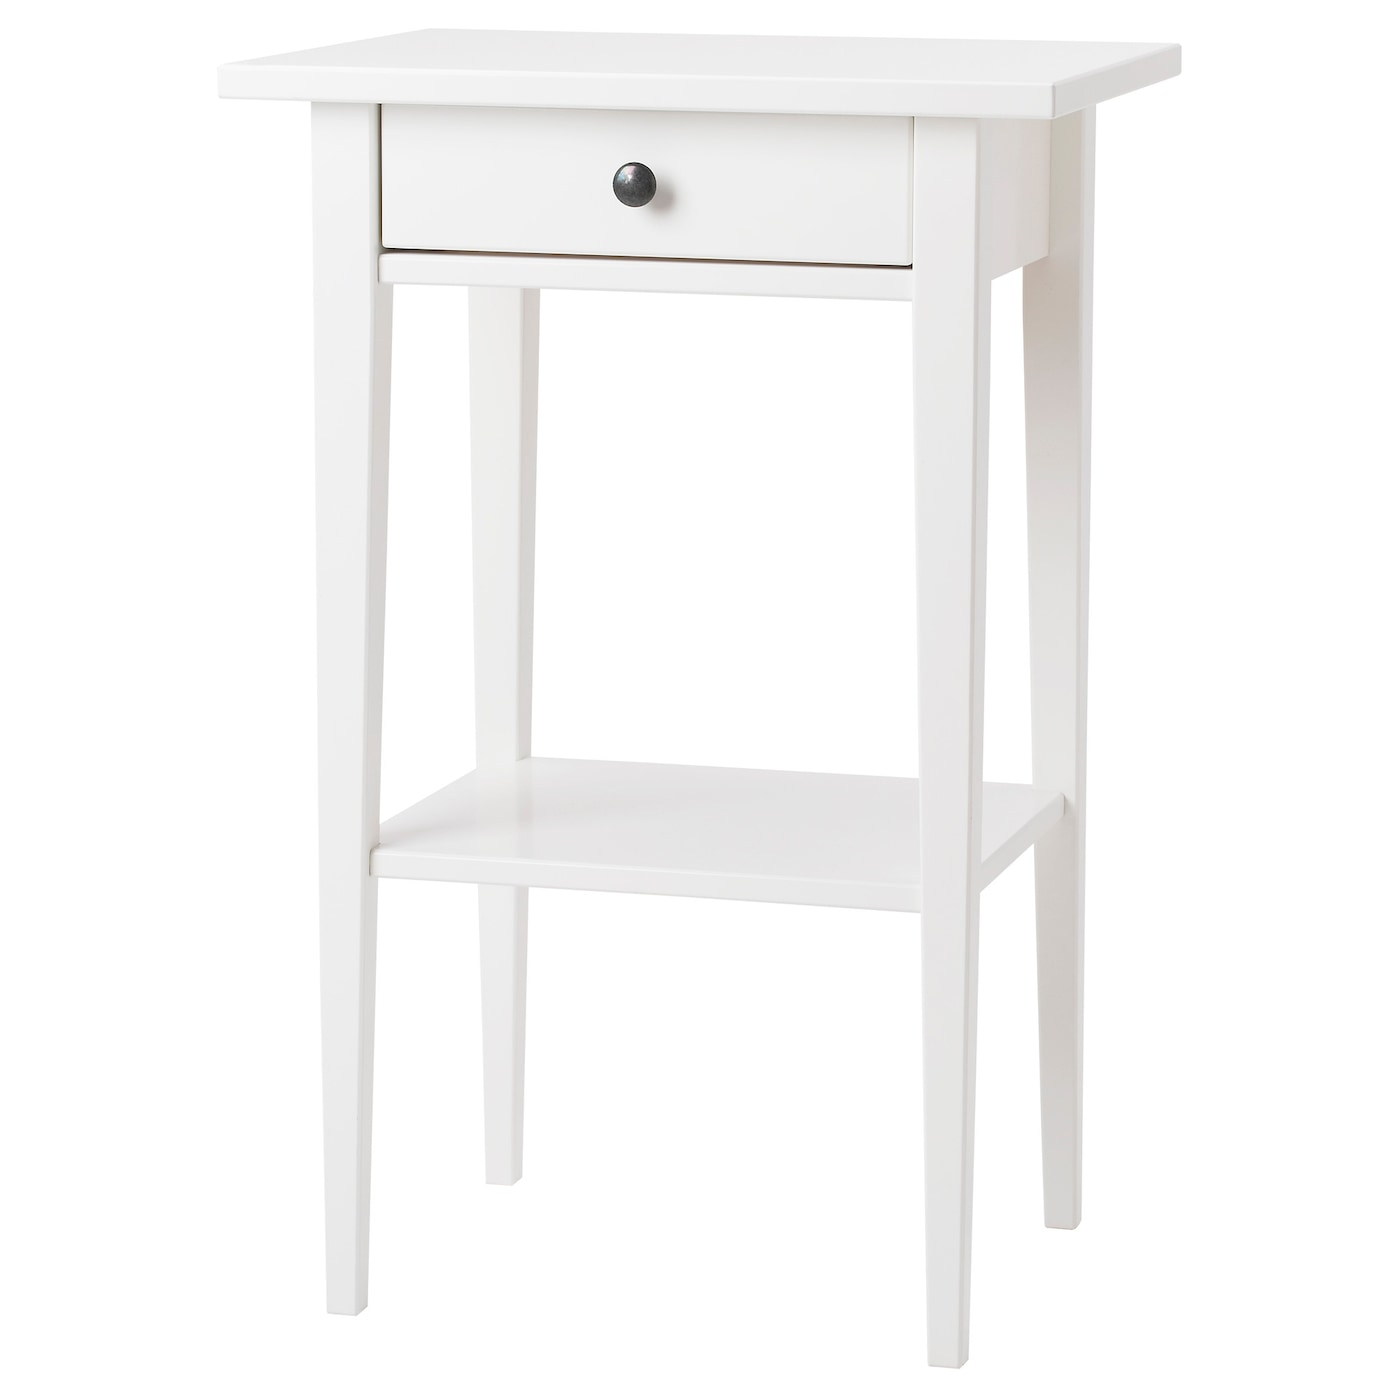 table de chevet design ikea. Black Bedroom Furniture Sets. Home Design Ideas